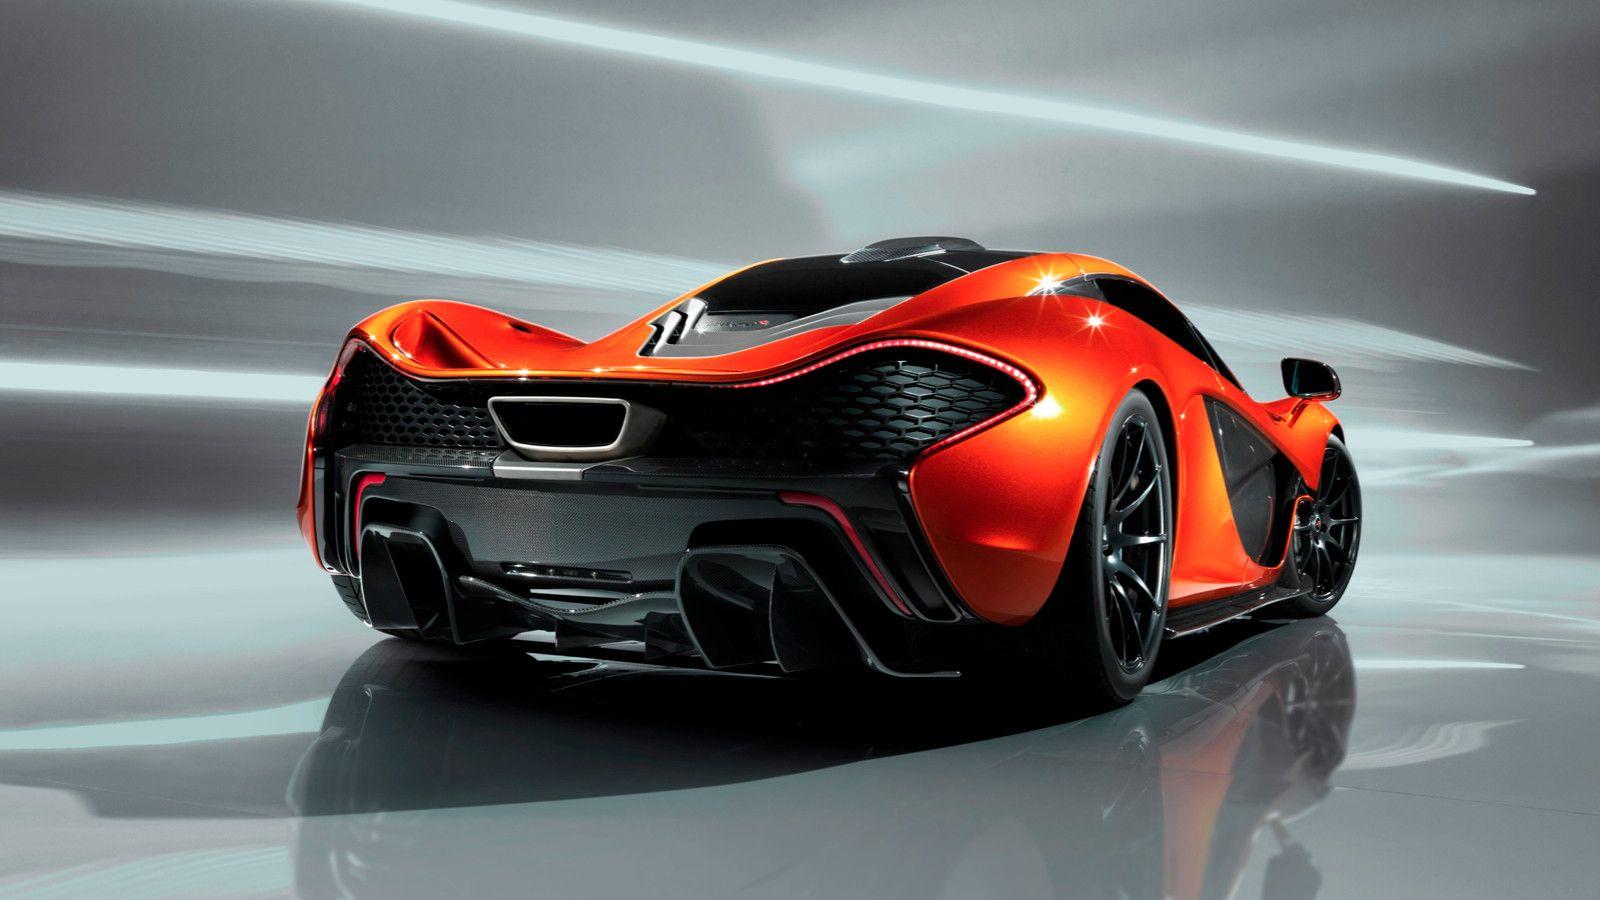 Mclaren P1 Rear View Sports Cars Luxury Mclaren P1 Dream Cars